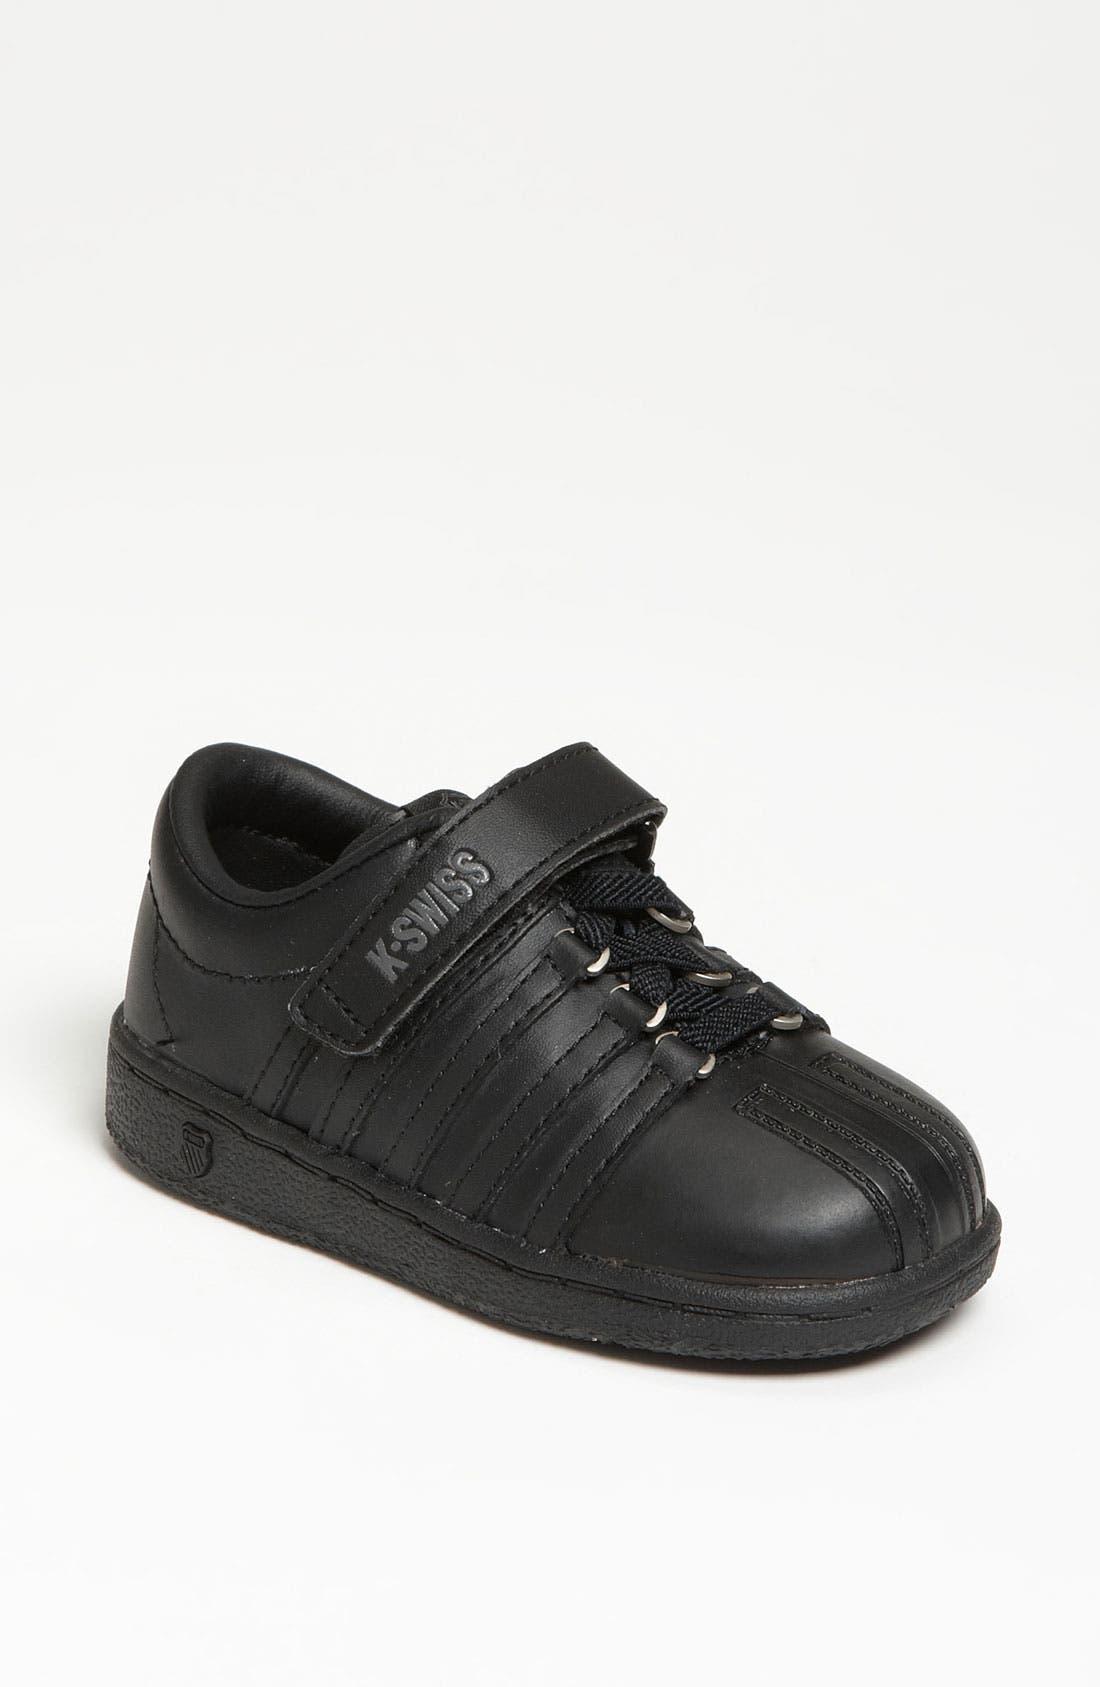 Alternate Image 1 Selected - K-Swiss Classic Sneaker (Baby, Walker & Toddler)